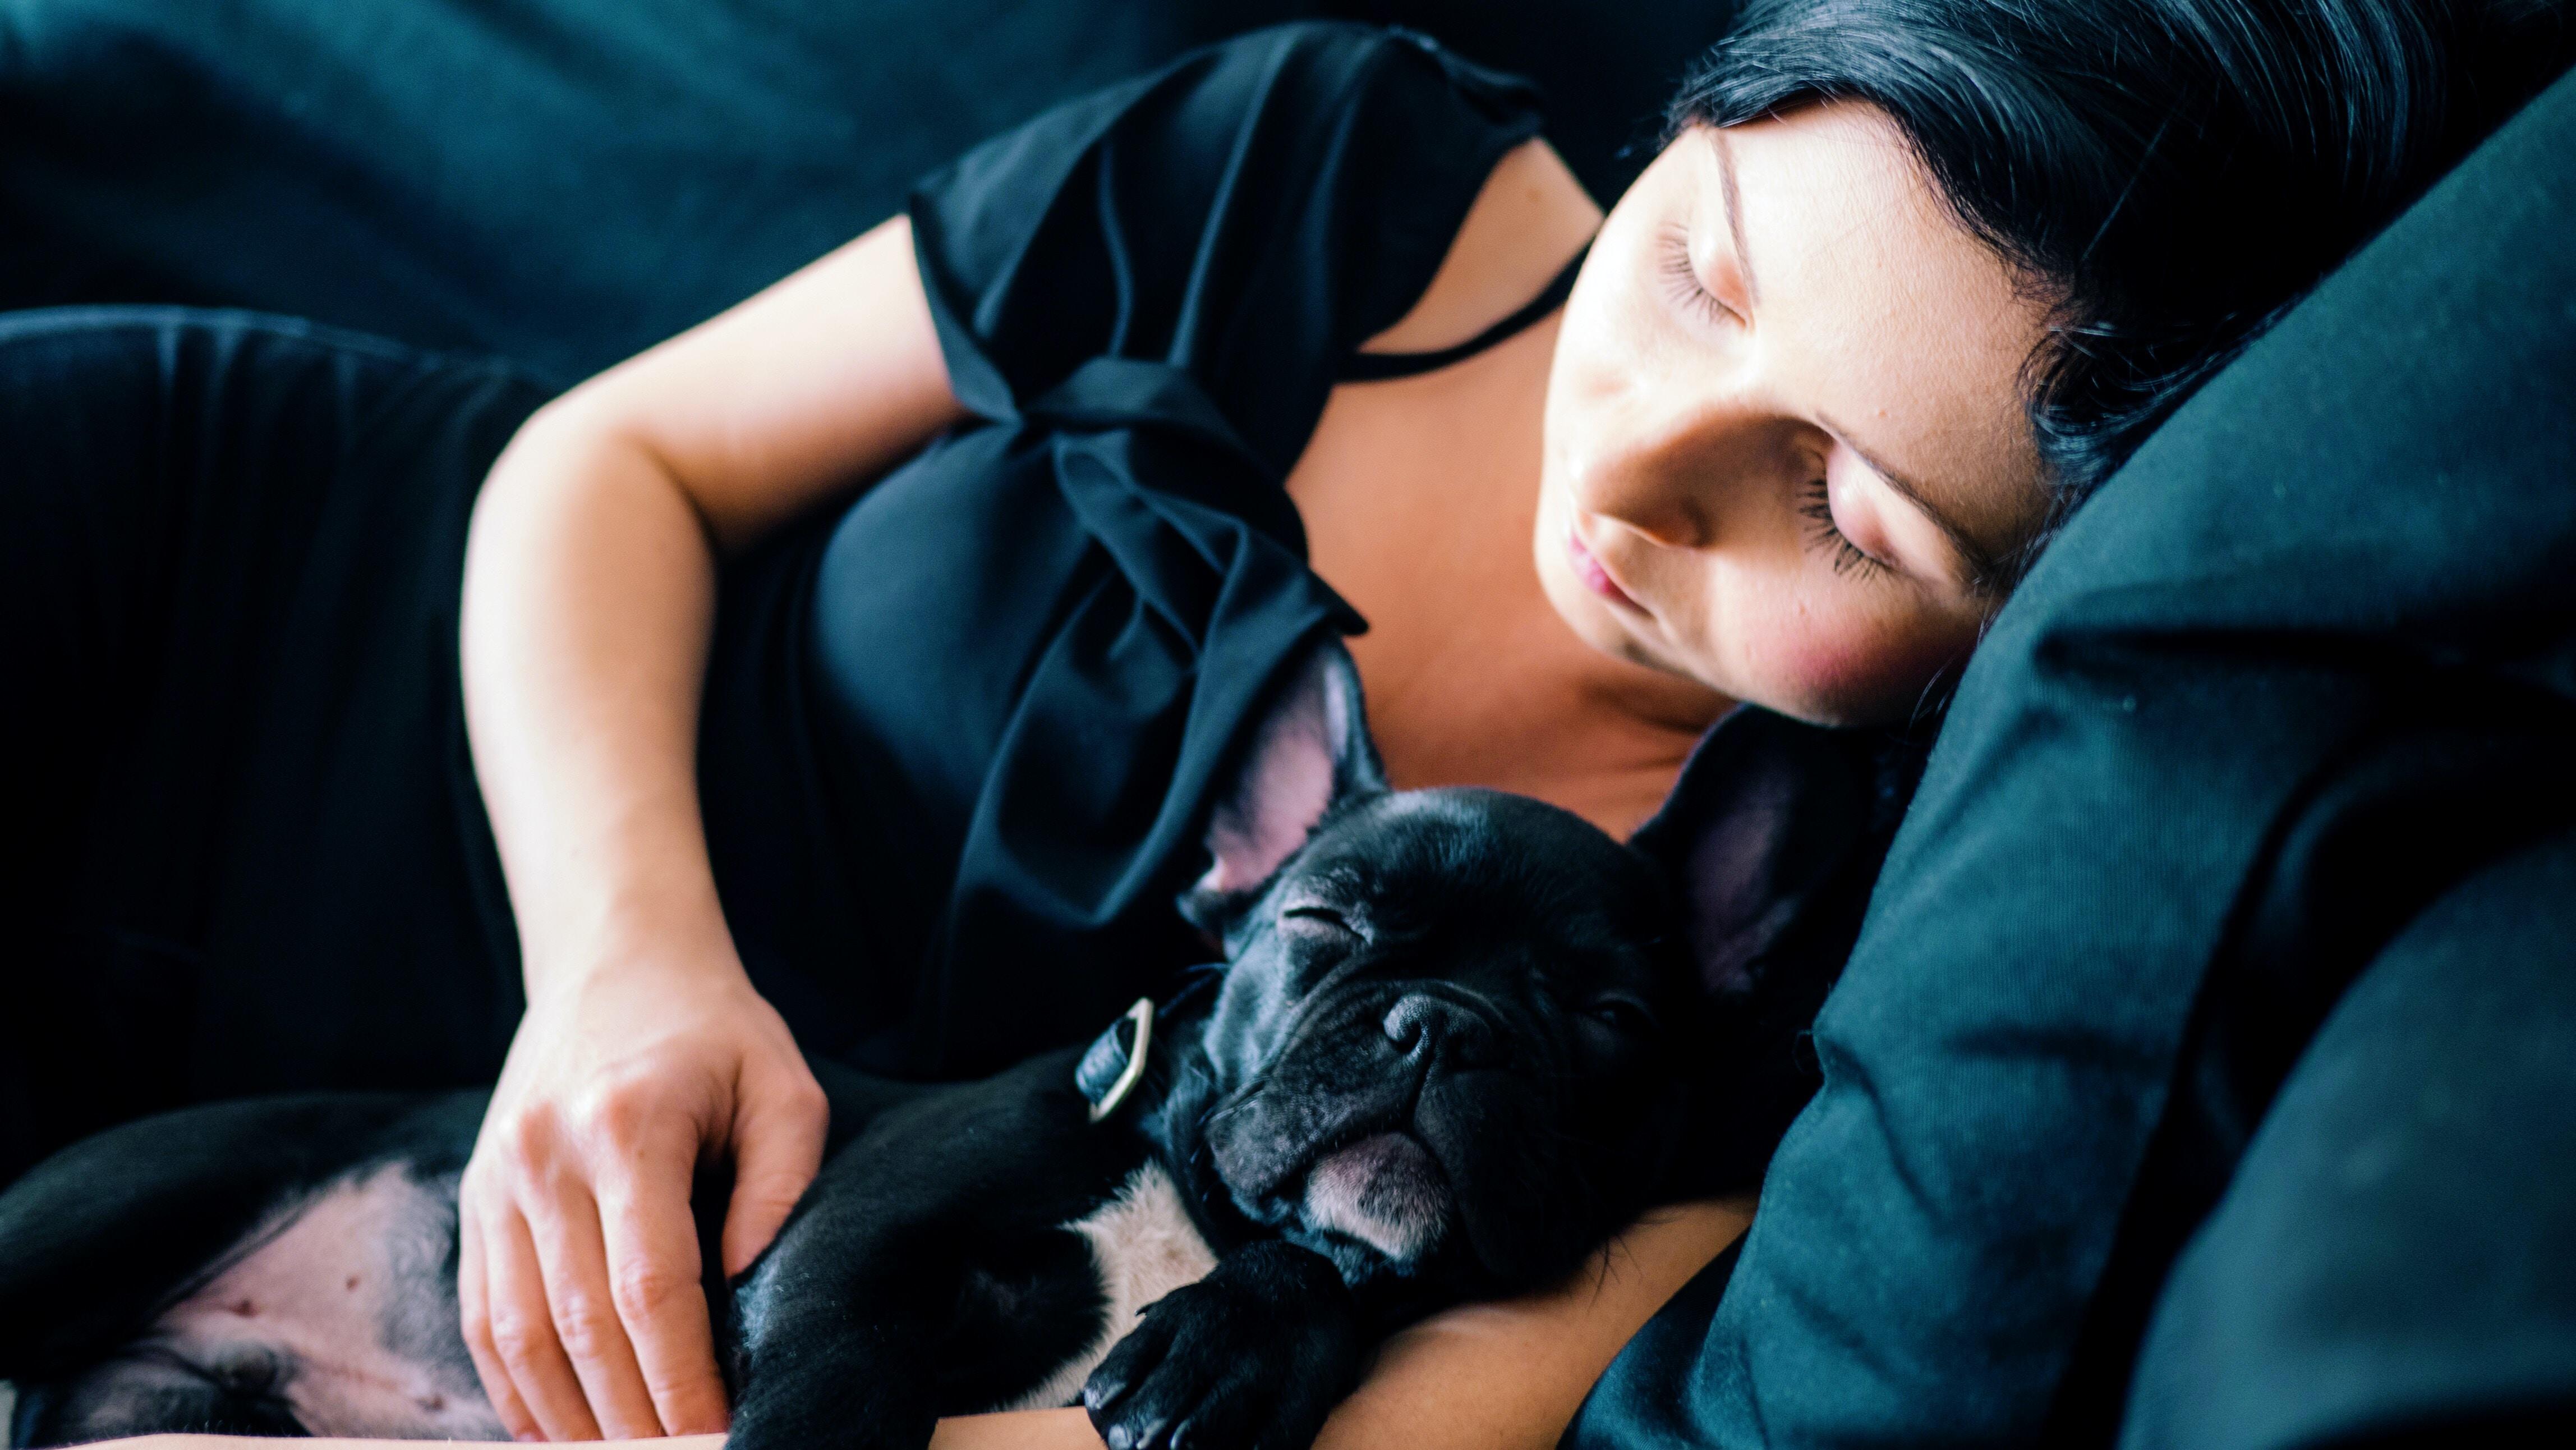 manfaat pola tidur yang teratur untuk menurunkan berat badan